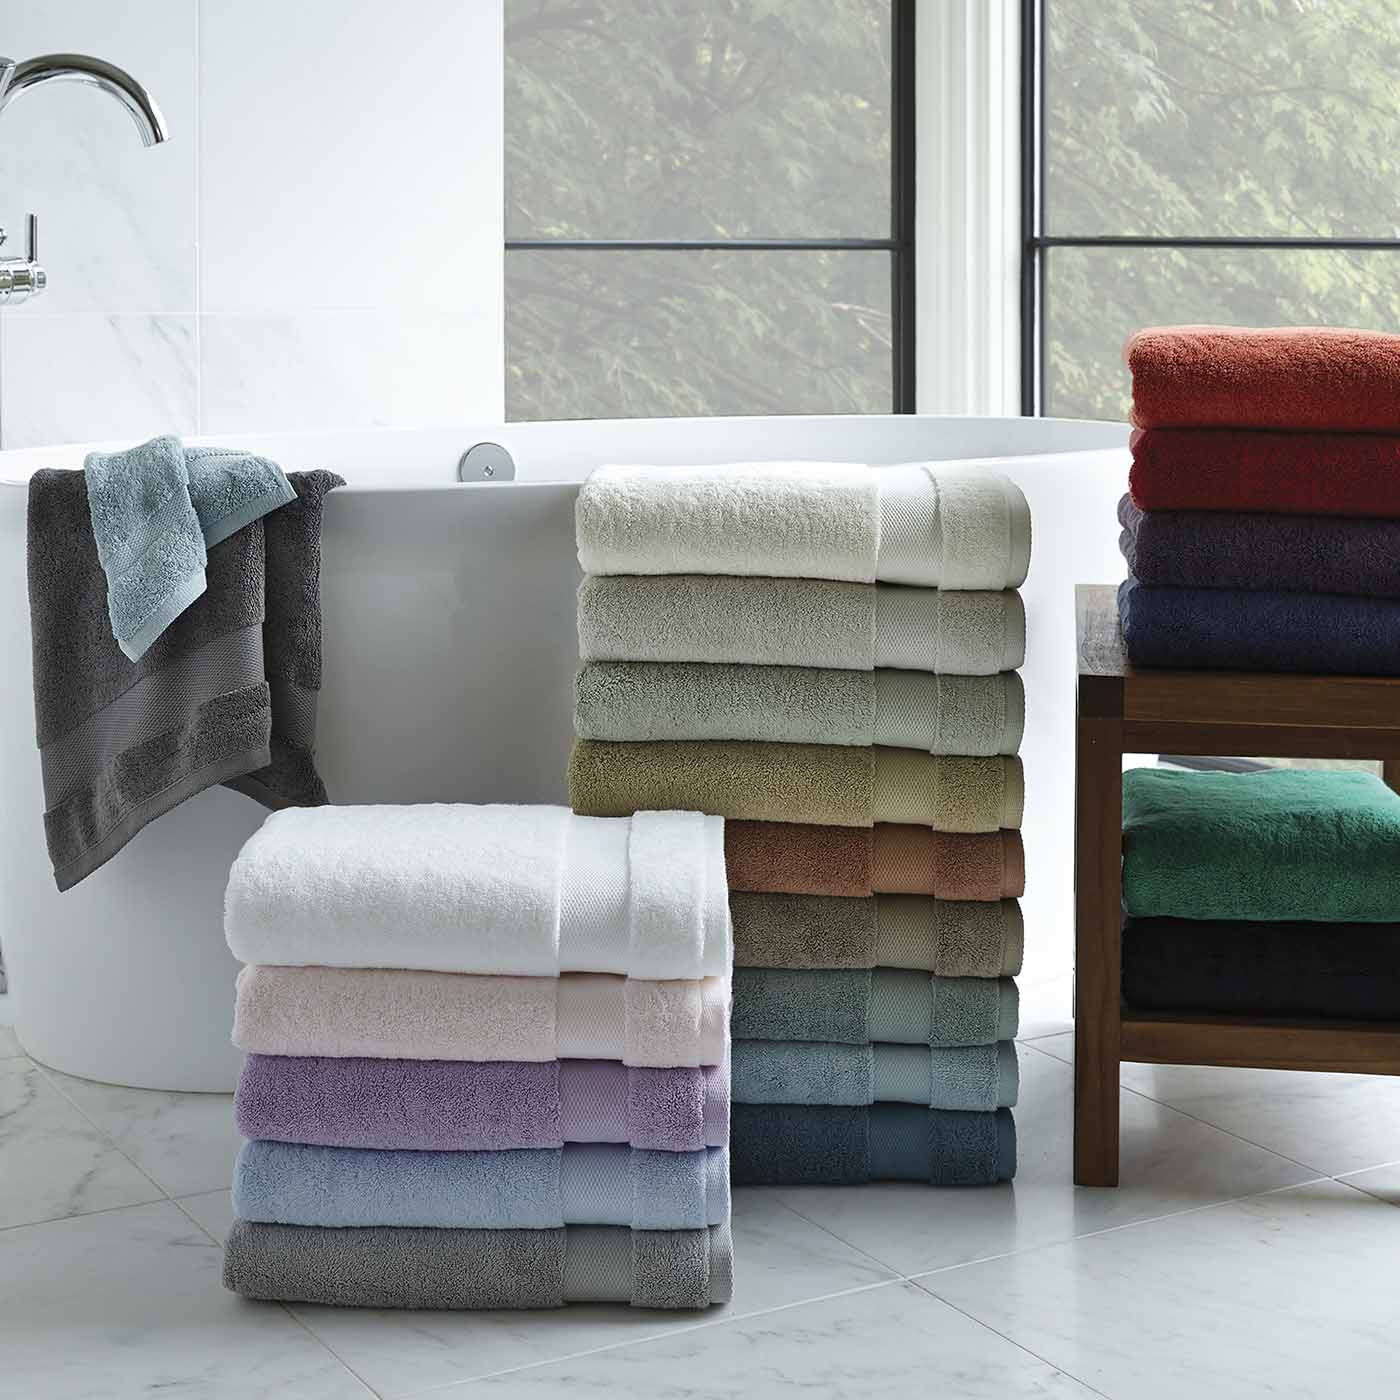 Kassatex Kassadesign Brights Bath Rugs Gracious Style